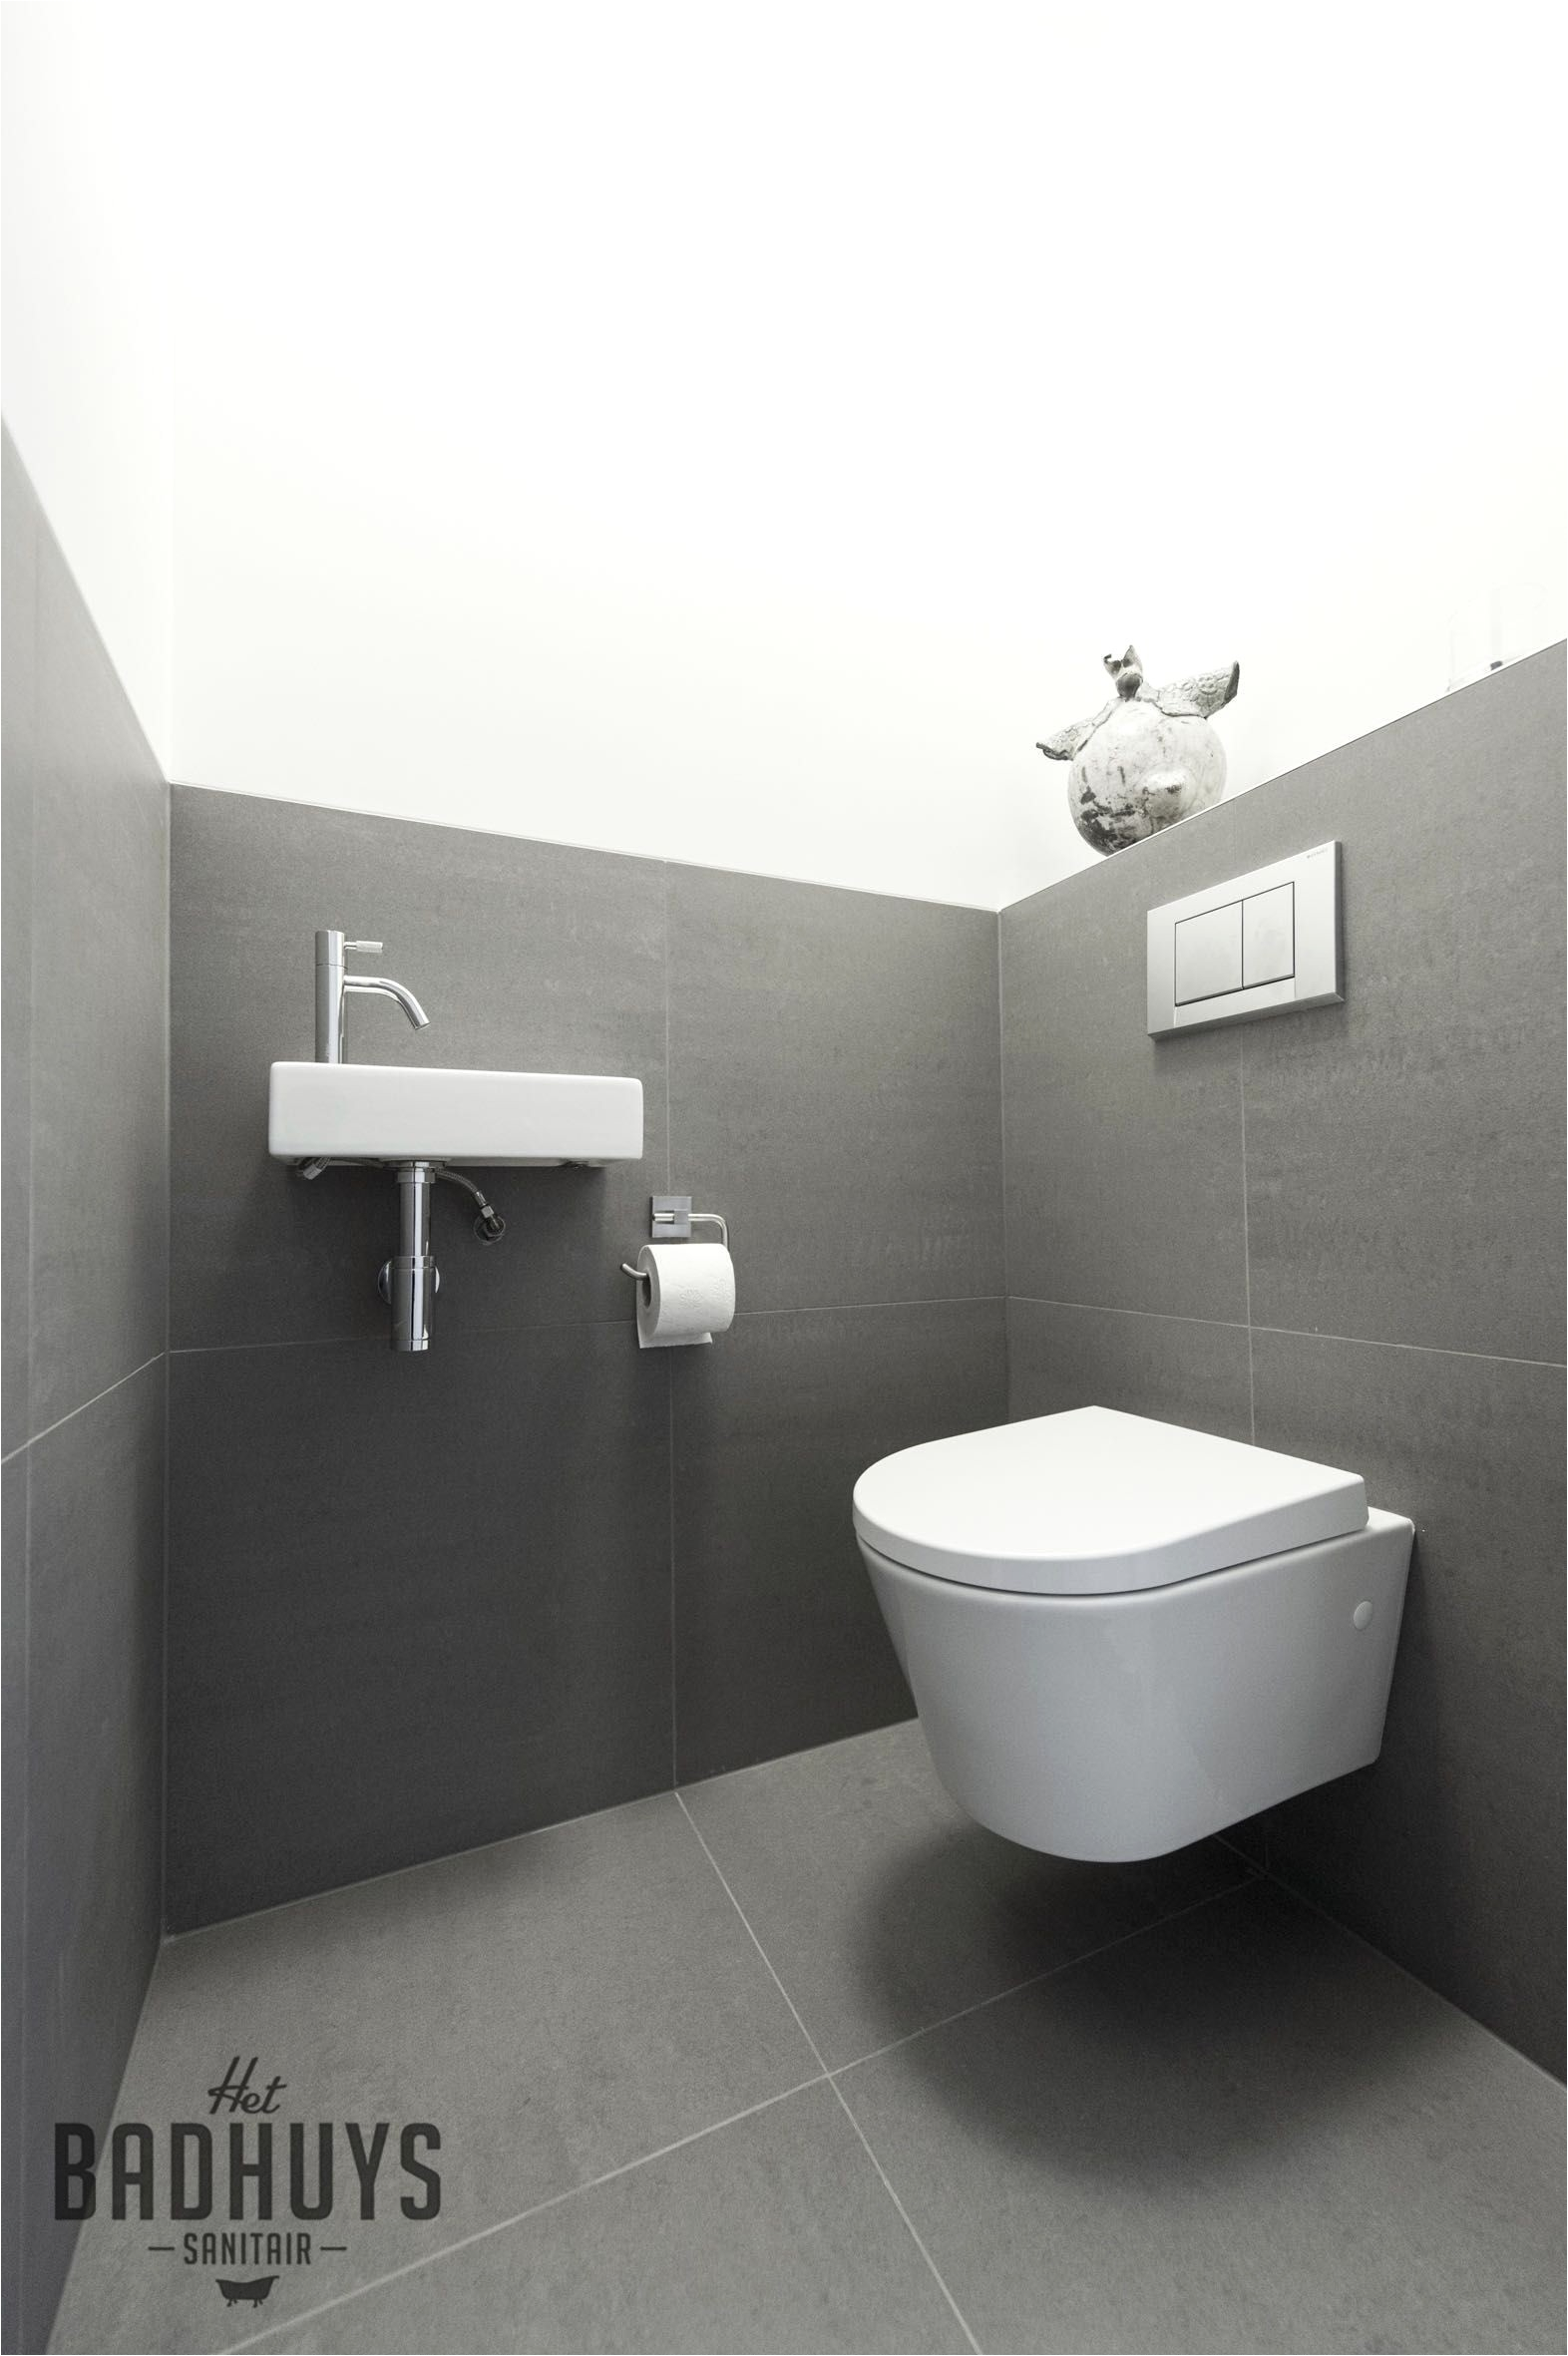 bathroom tiles ideas beautiful bathroom picture ideas lovely tag toilet ideas 0d best